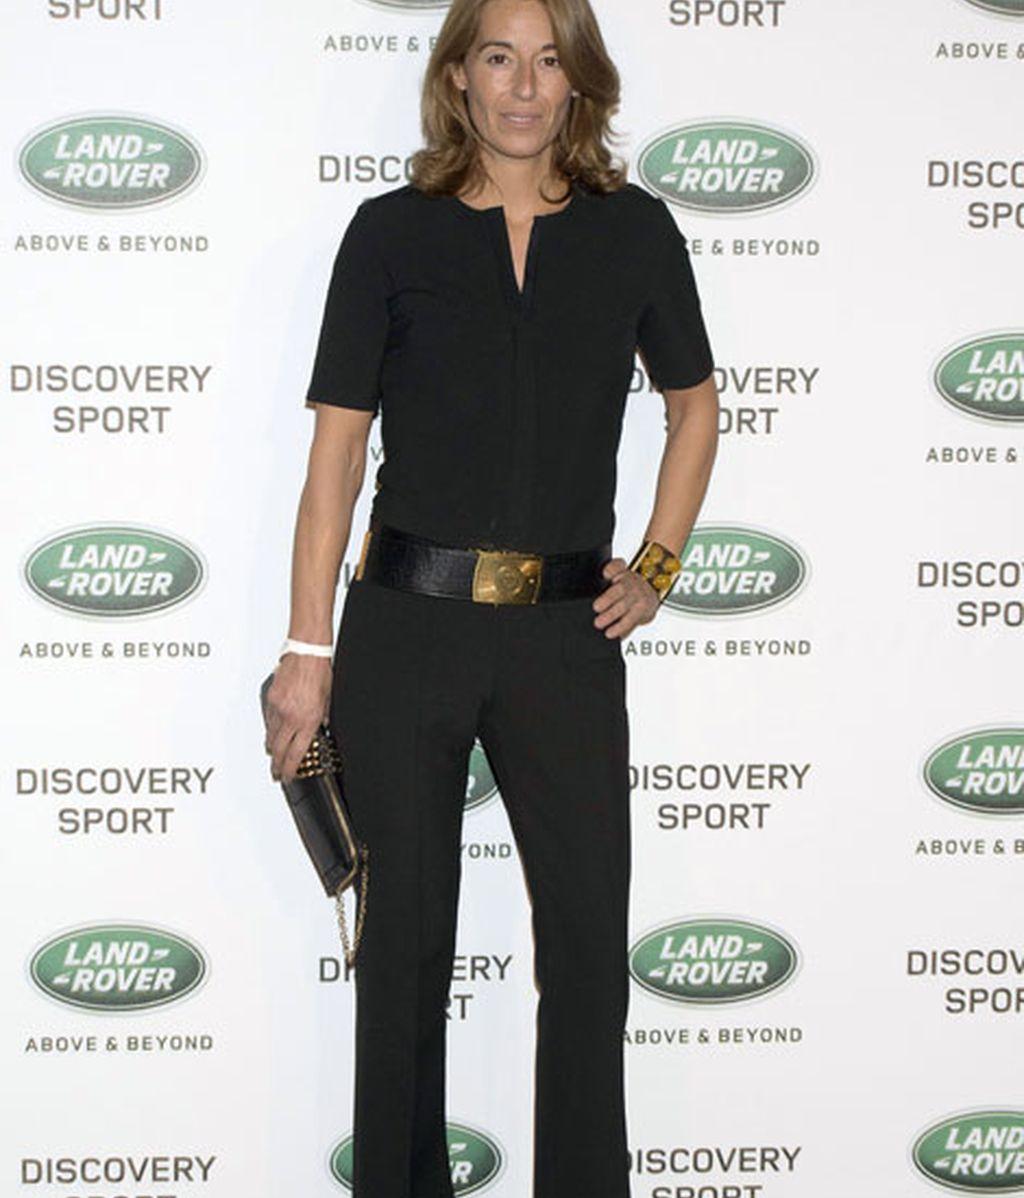 Mónica Martín Luque apostó por camisa y pantalón con un llamativo cinturón